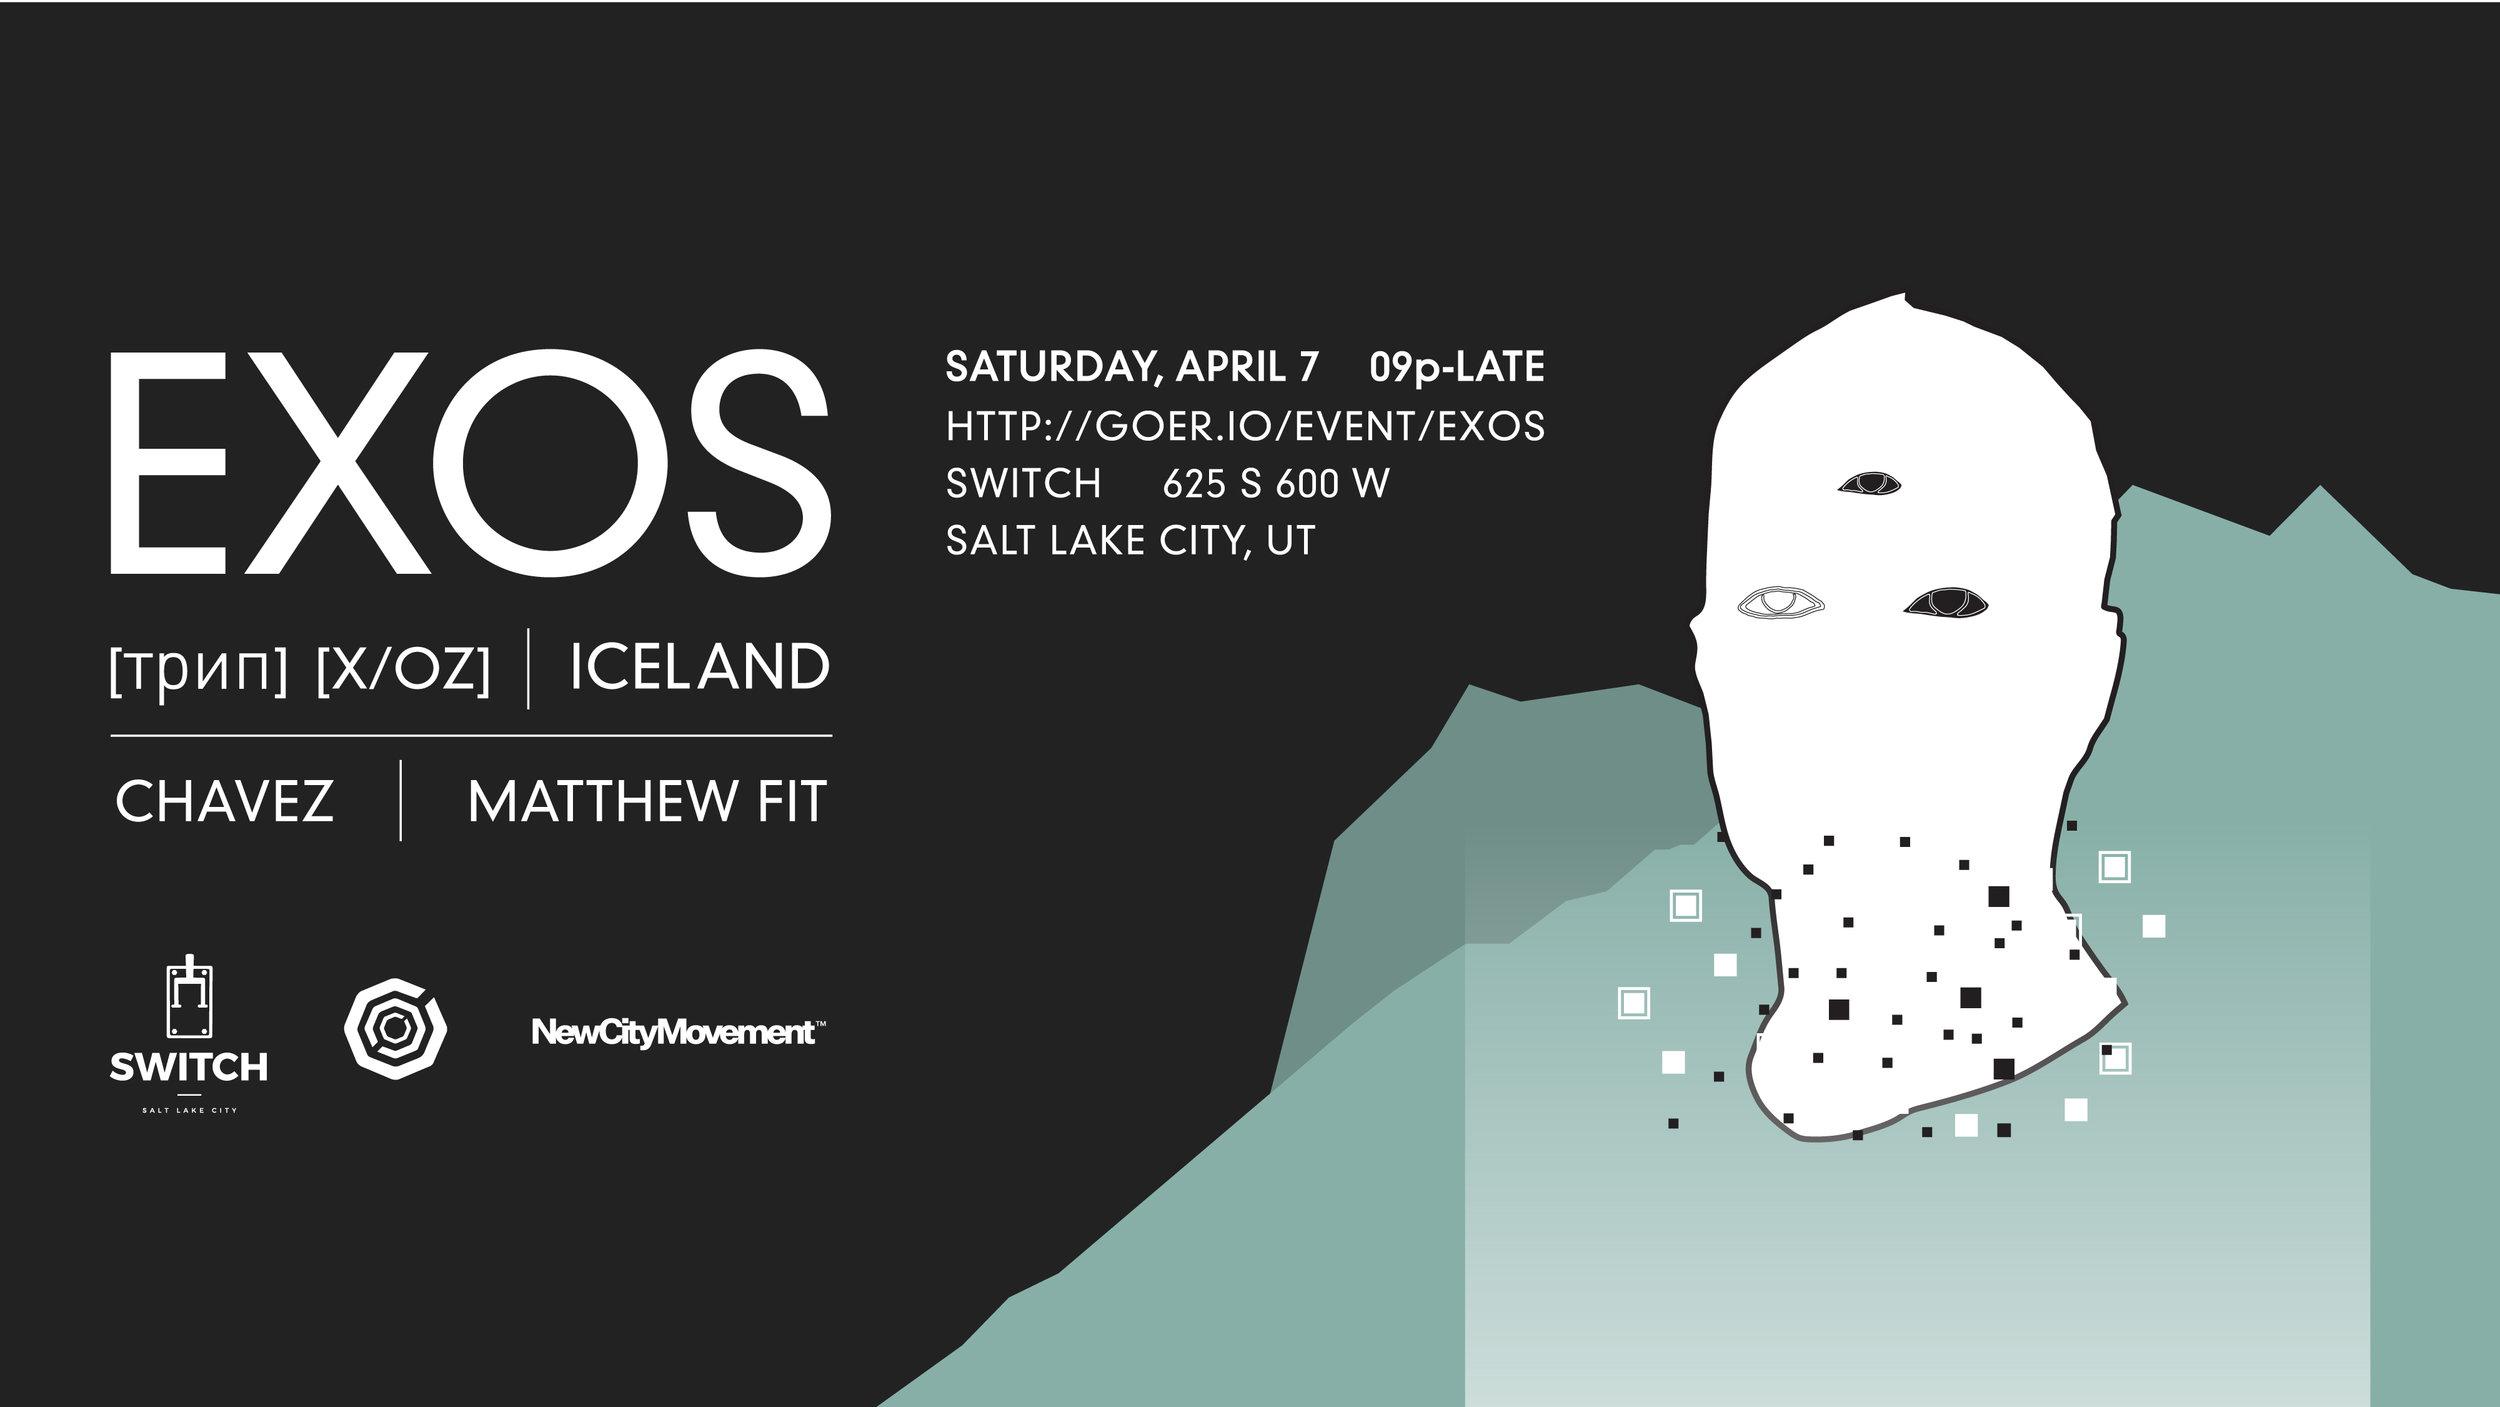 EXOS-ICELAND-SALT-LAKE-CITY-TECHNO-SWITCH